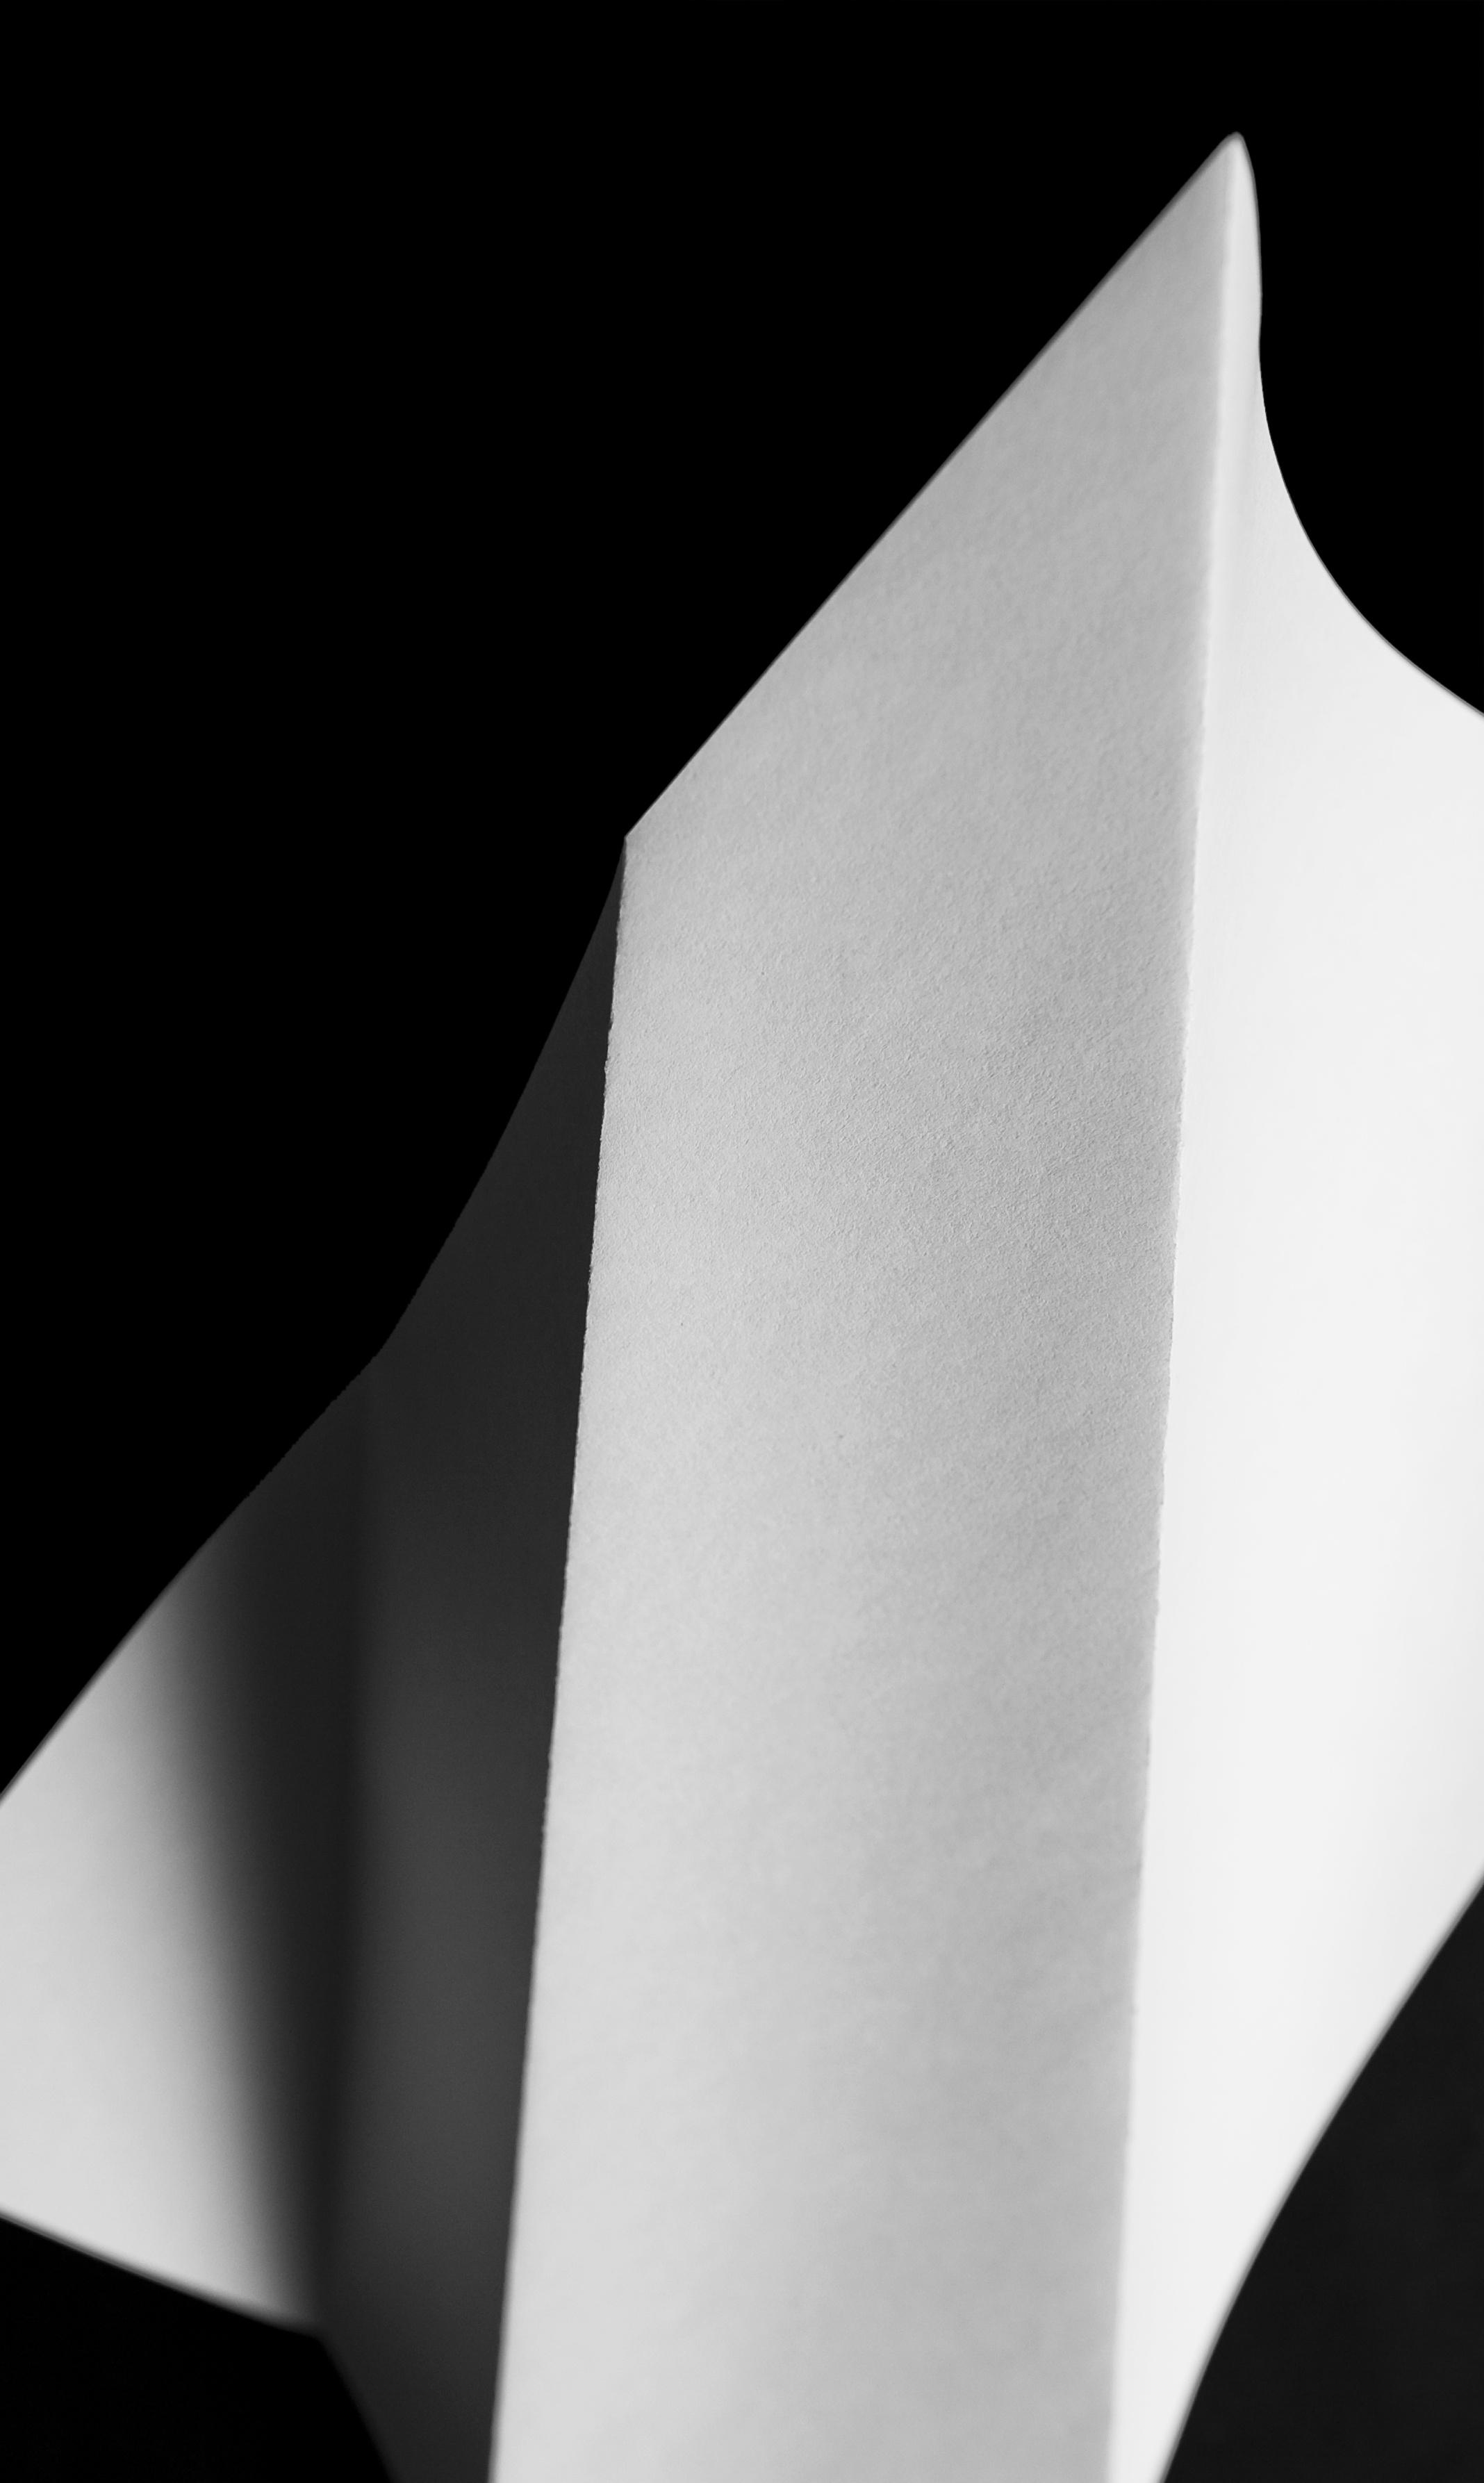 a4 纸 创意平面广告